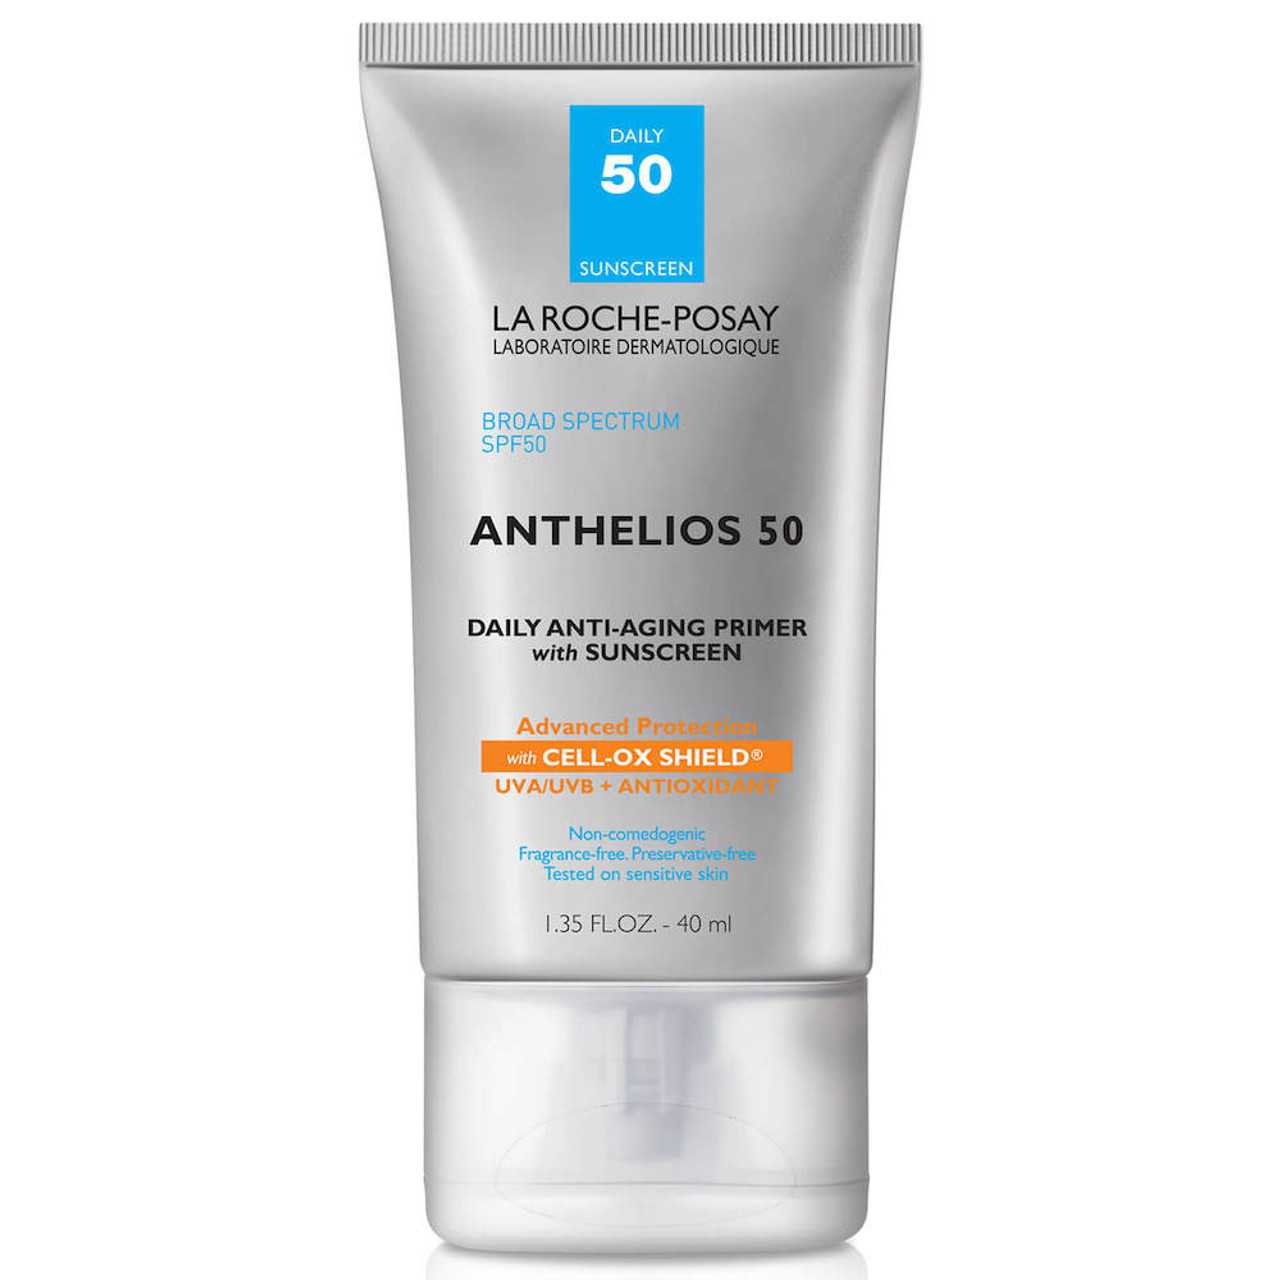 La Roche Posay Anthelios Anti-Aging Face Primer SPF 50